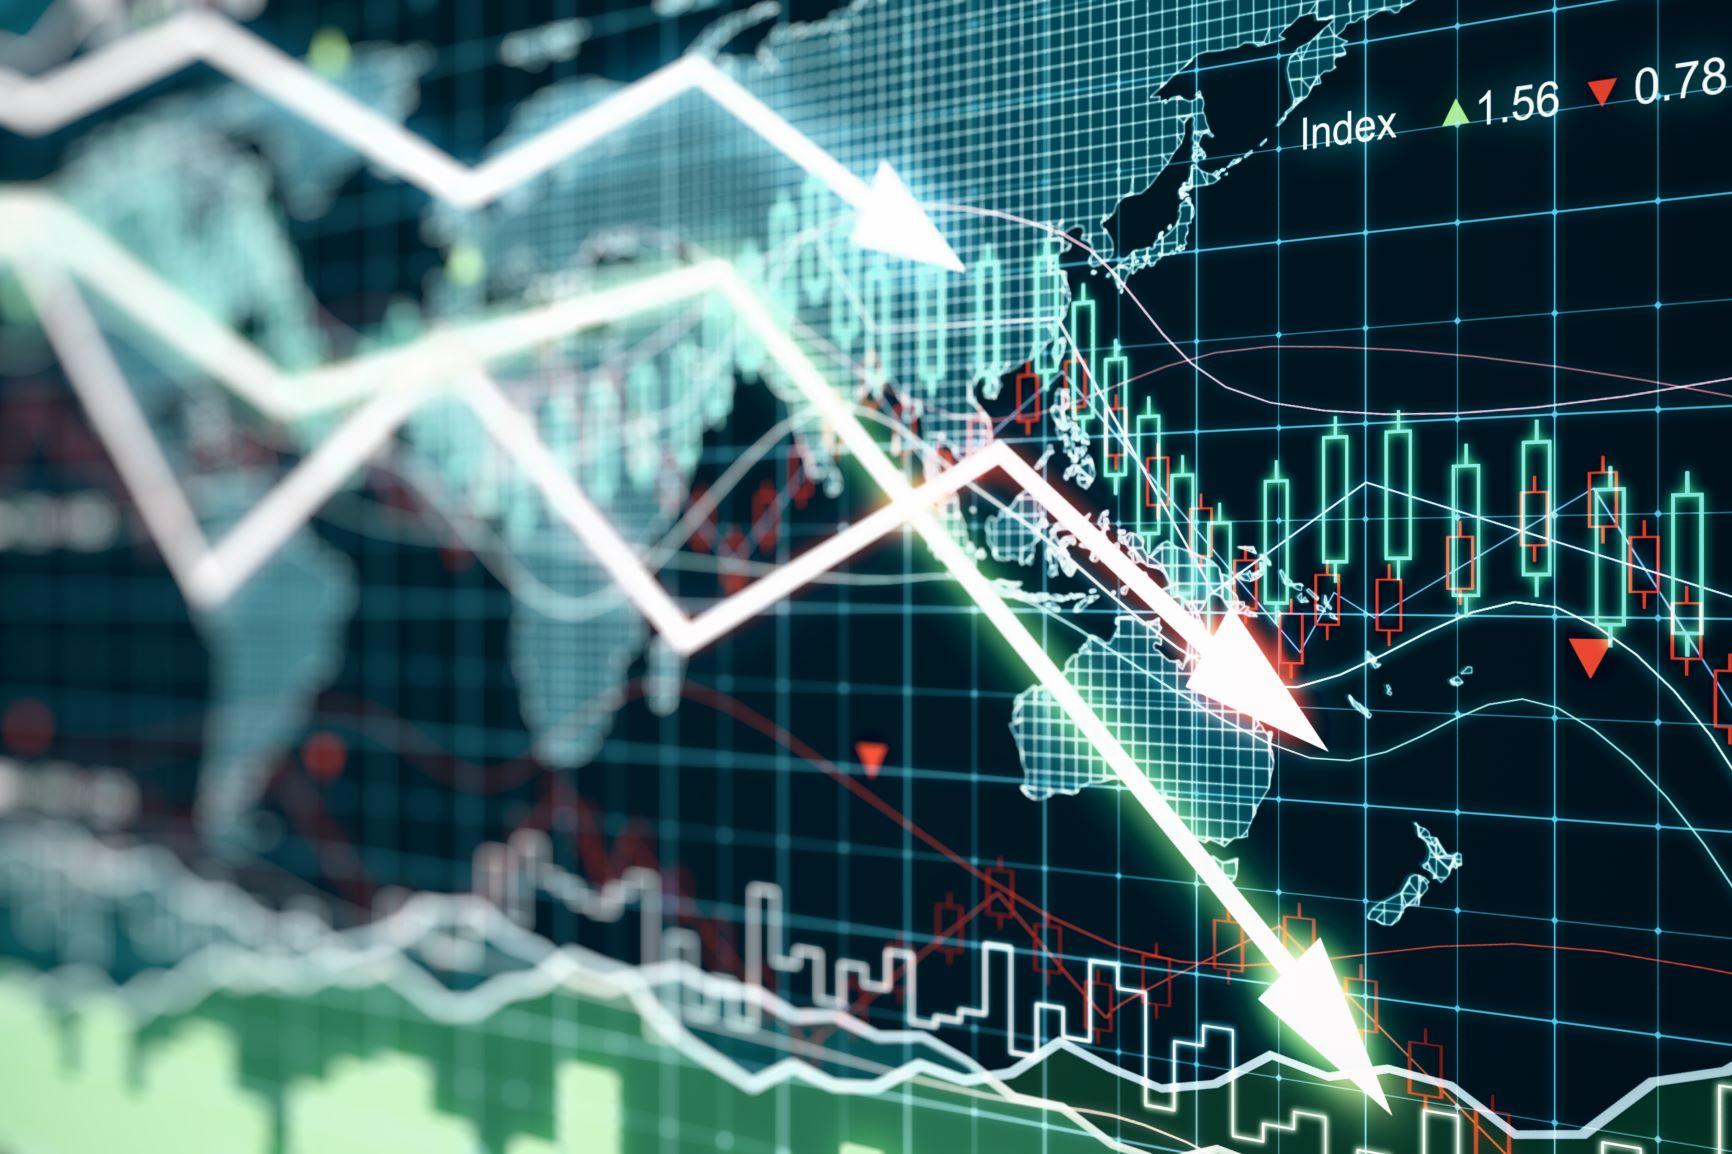 Debt sustainability index, Iraq election delay, Nigeria's second wave struggle